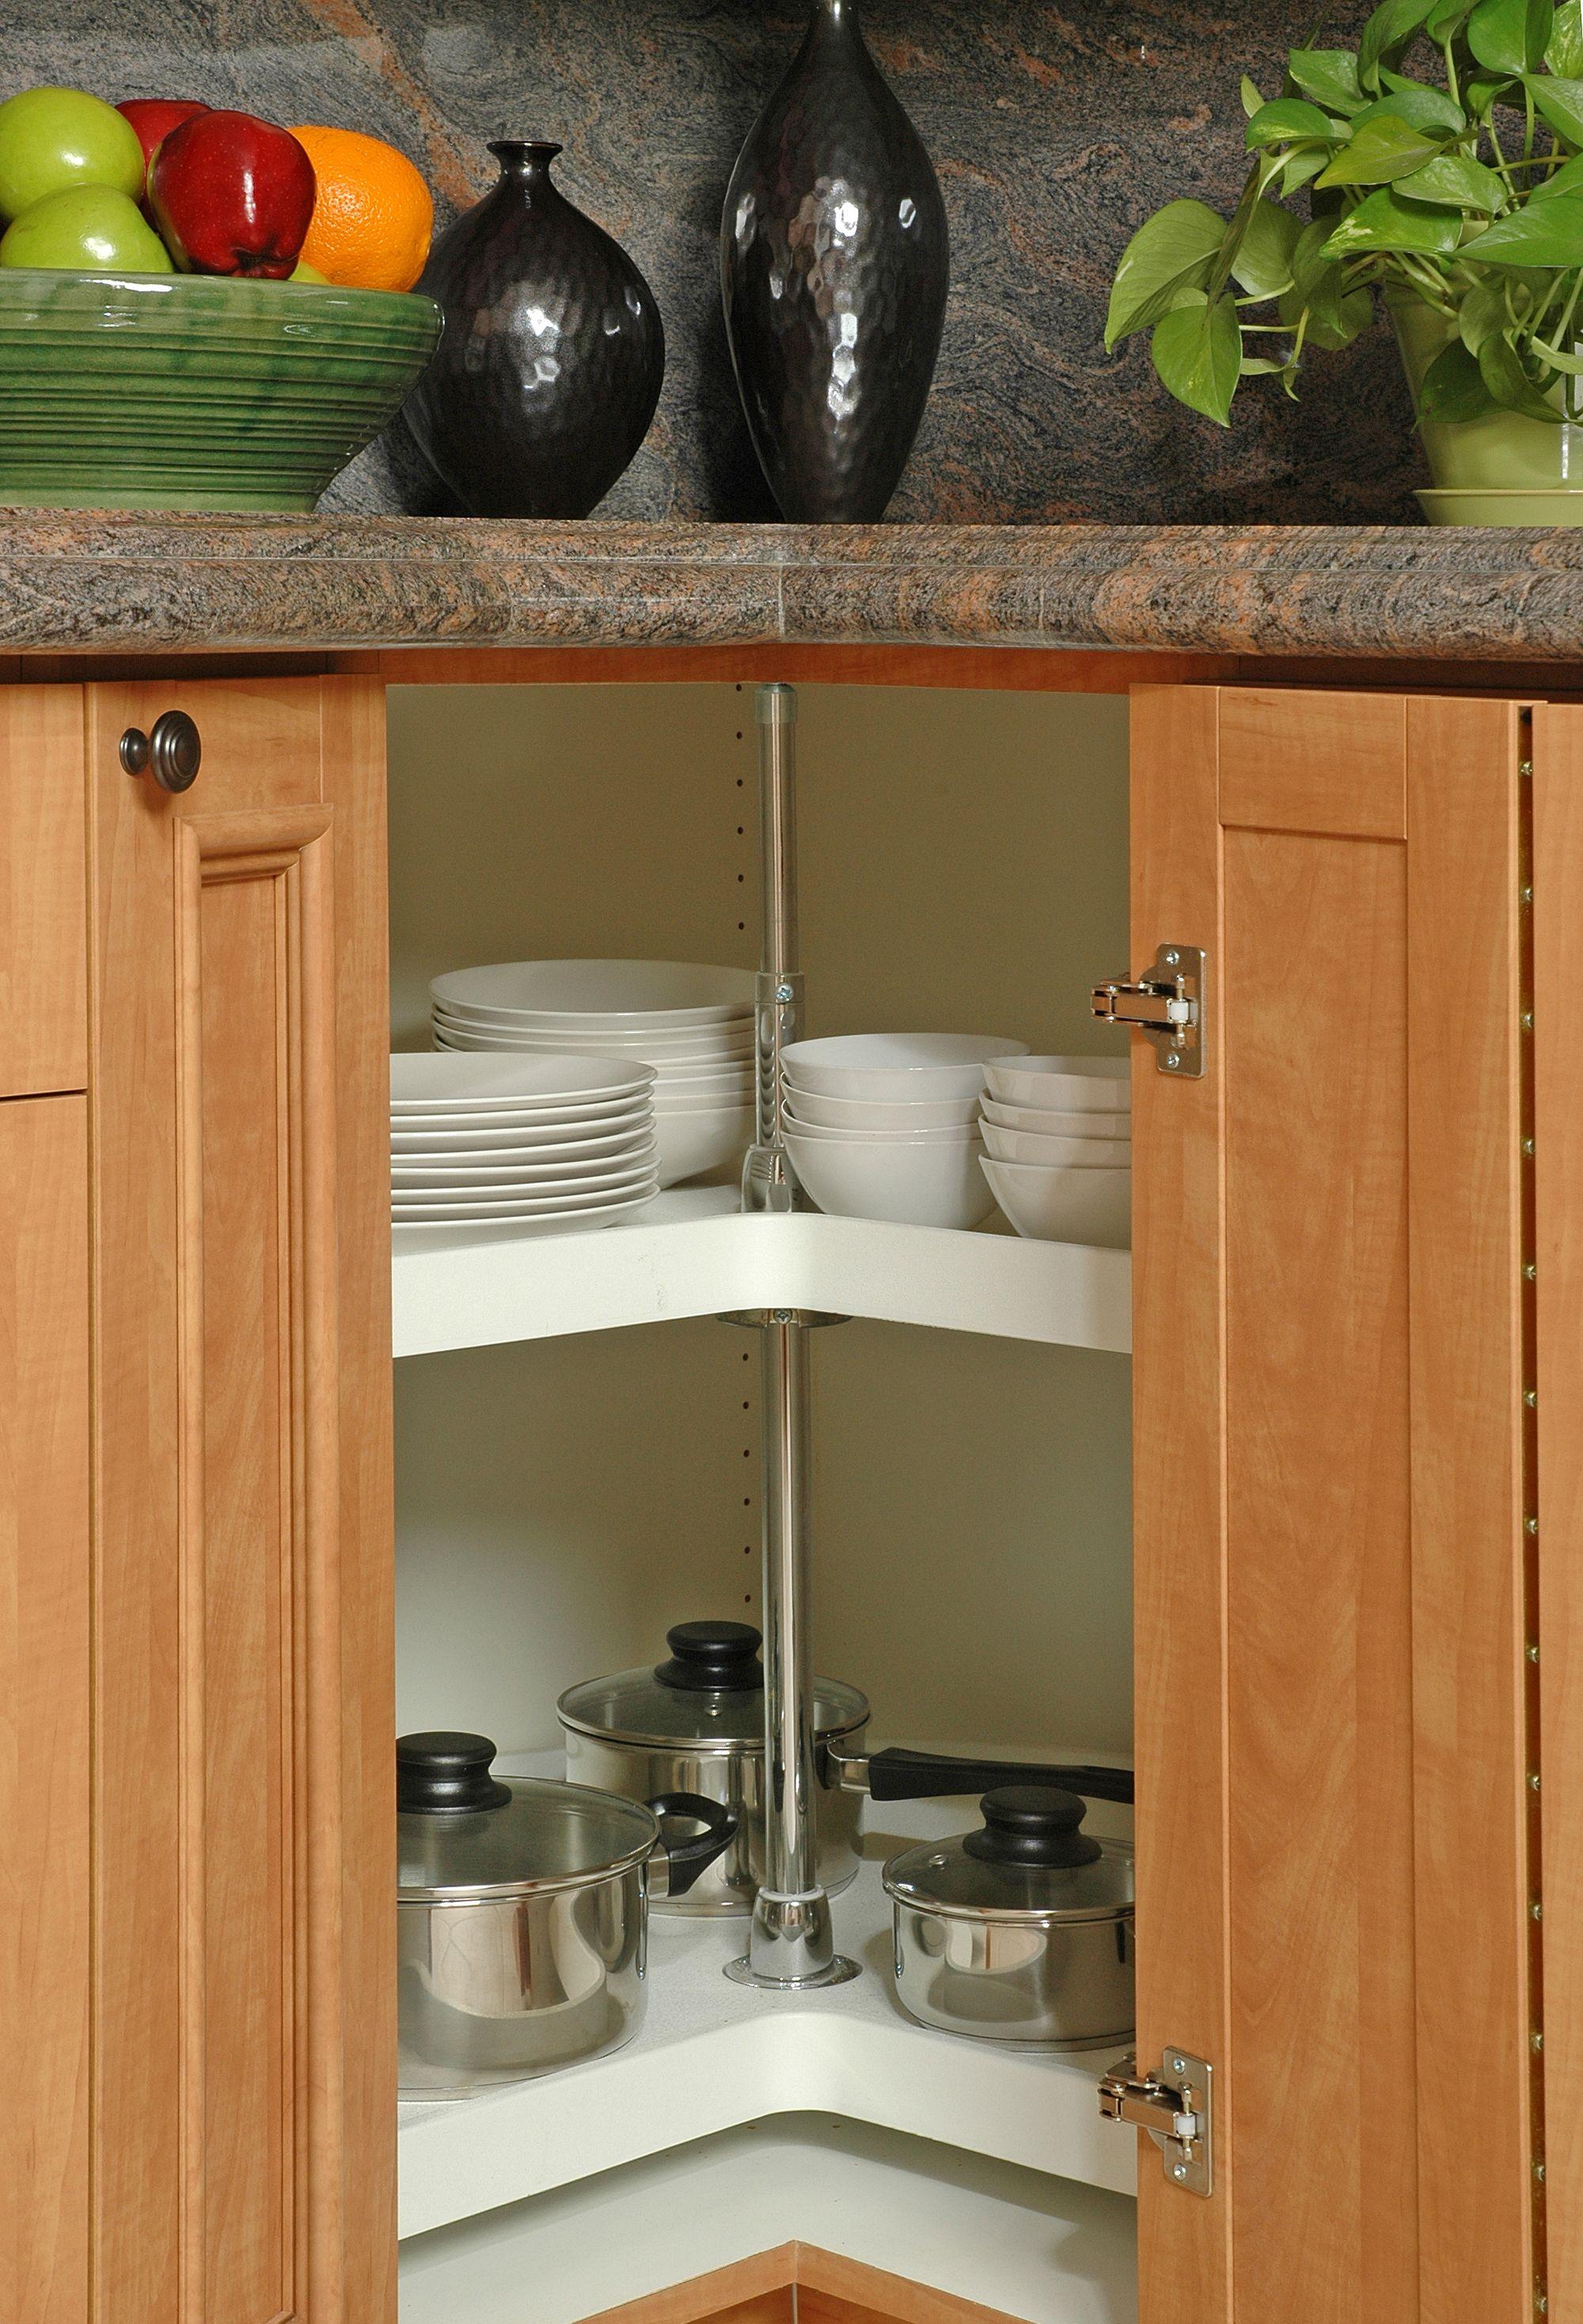 lazy susan kitchen cabinets bathroom medicine cabinet lazy susan on kitchen organization lazy susan cabinet id=81513